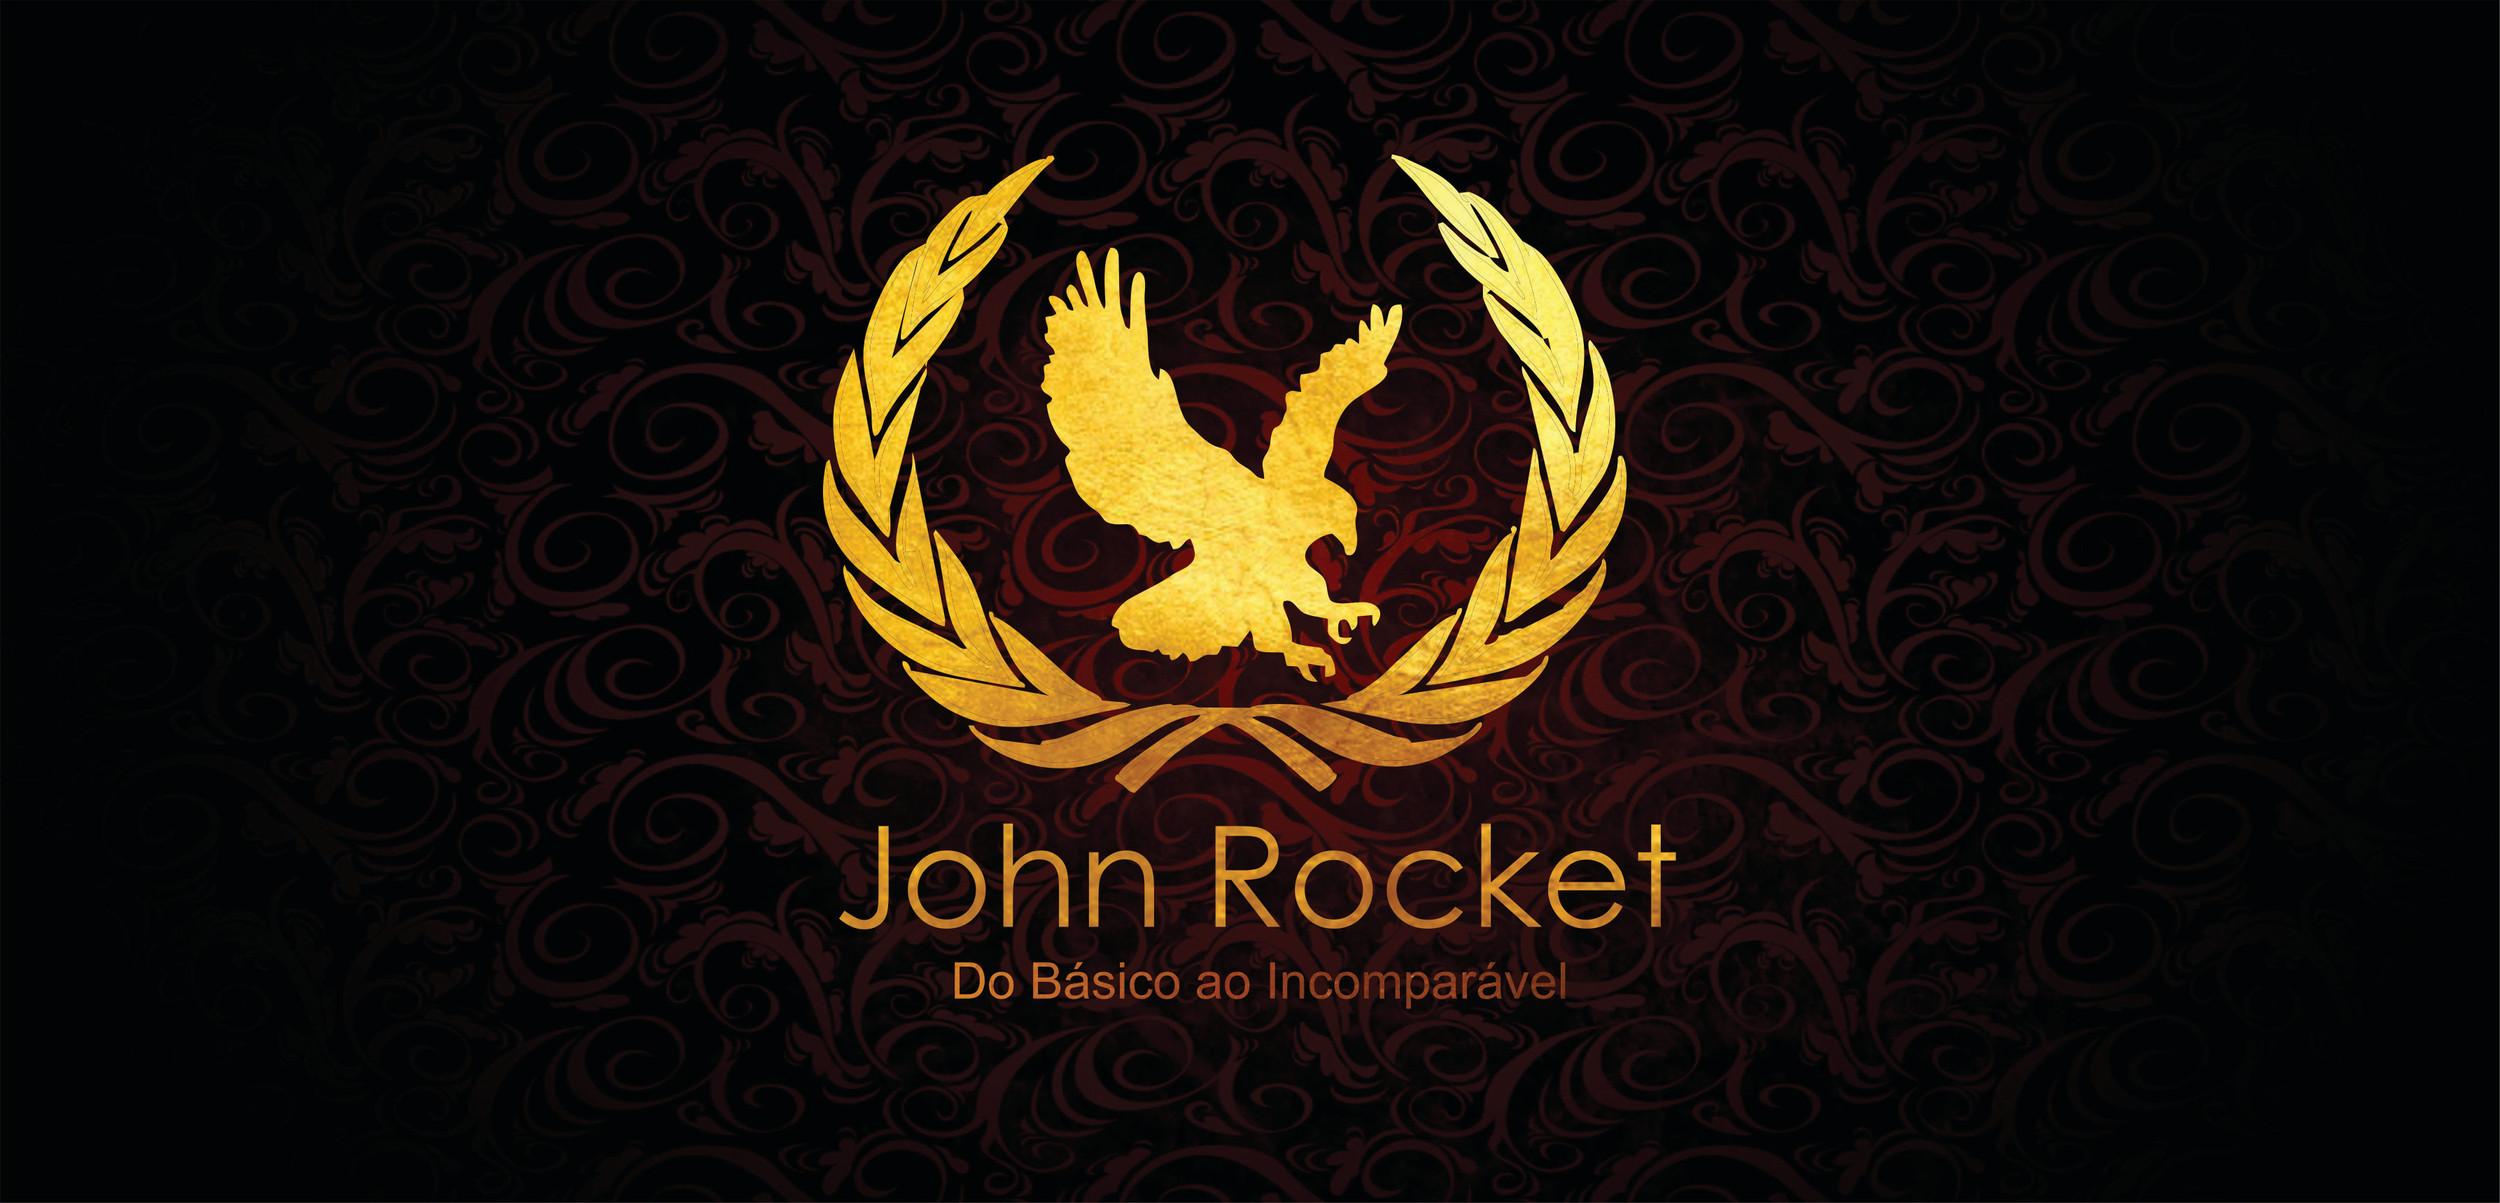 Resultado de imagem para john rocket